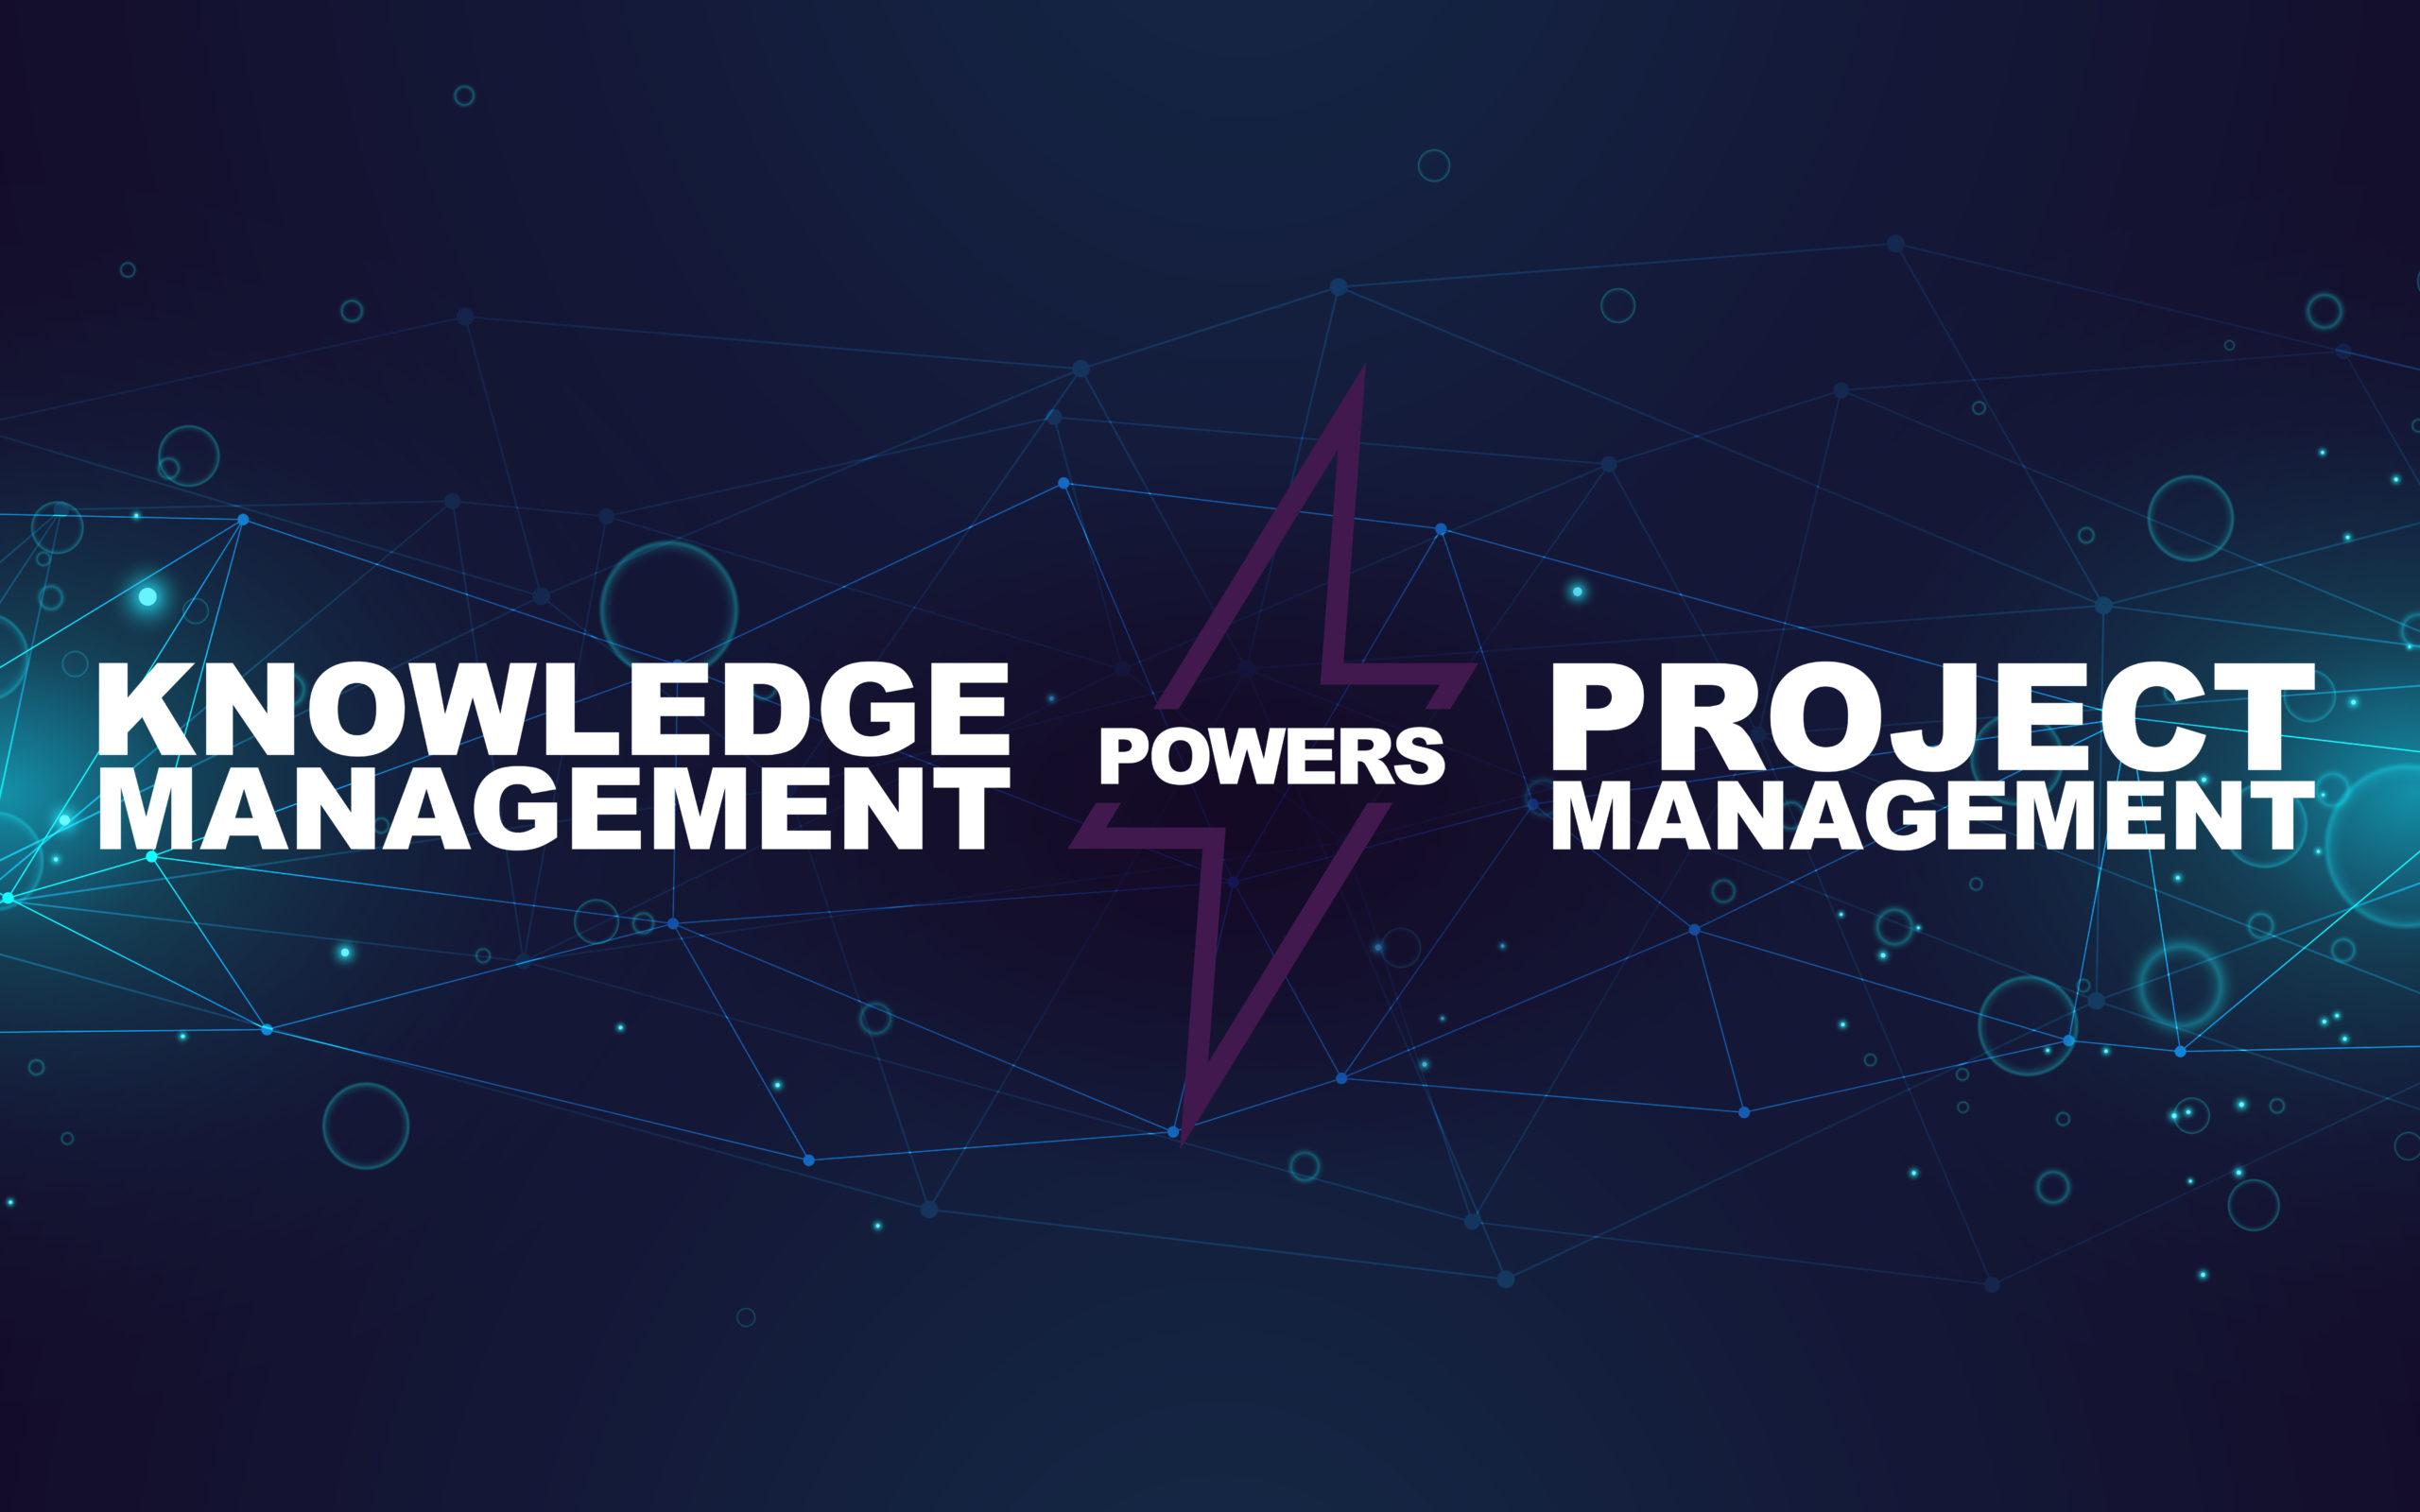 Knowledge Management powers Project Management